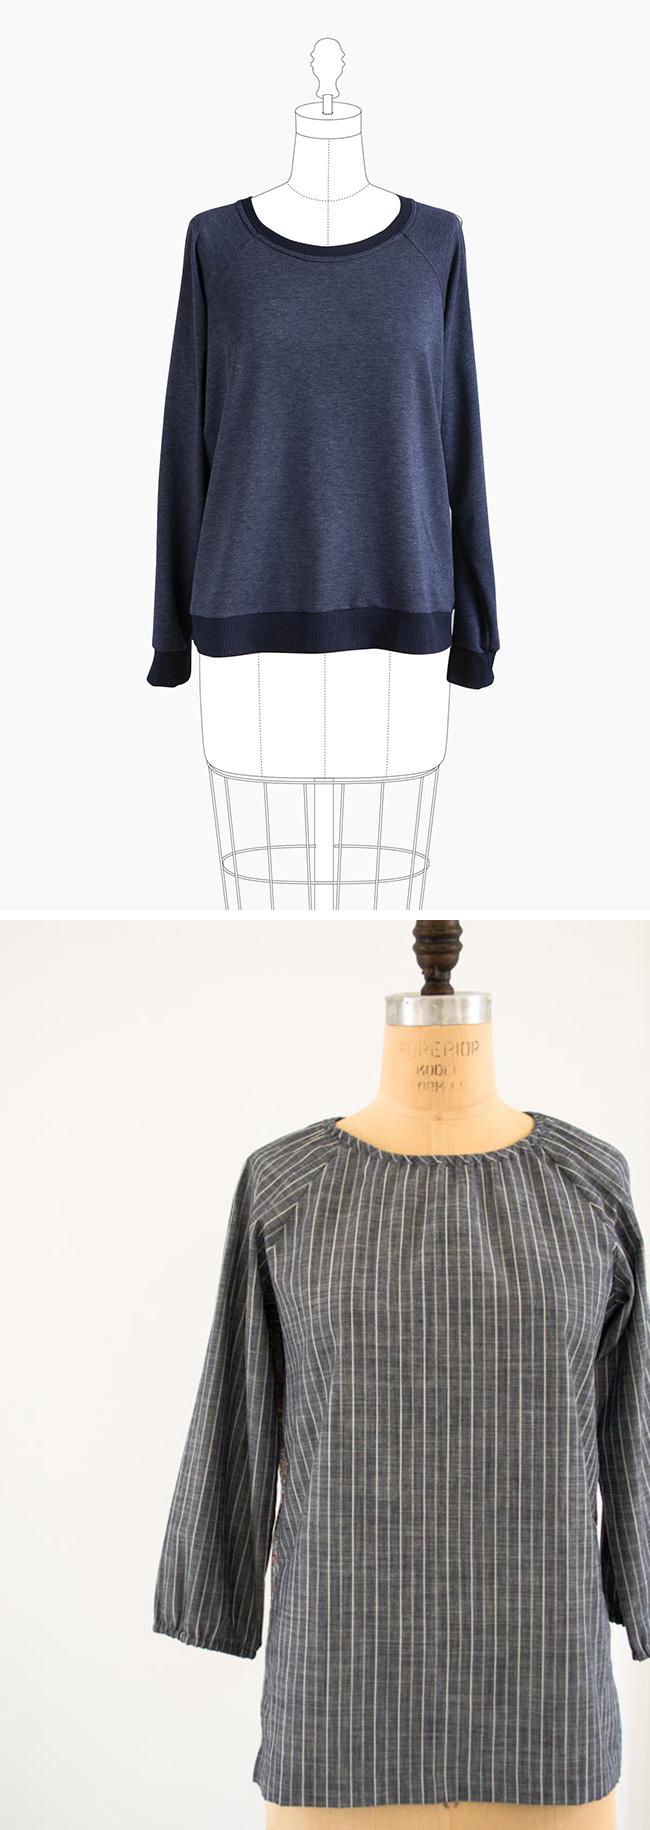 Winter wardrobe fix, part 1: Simple sewn tops